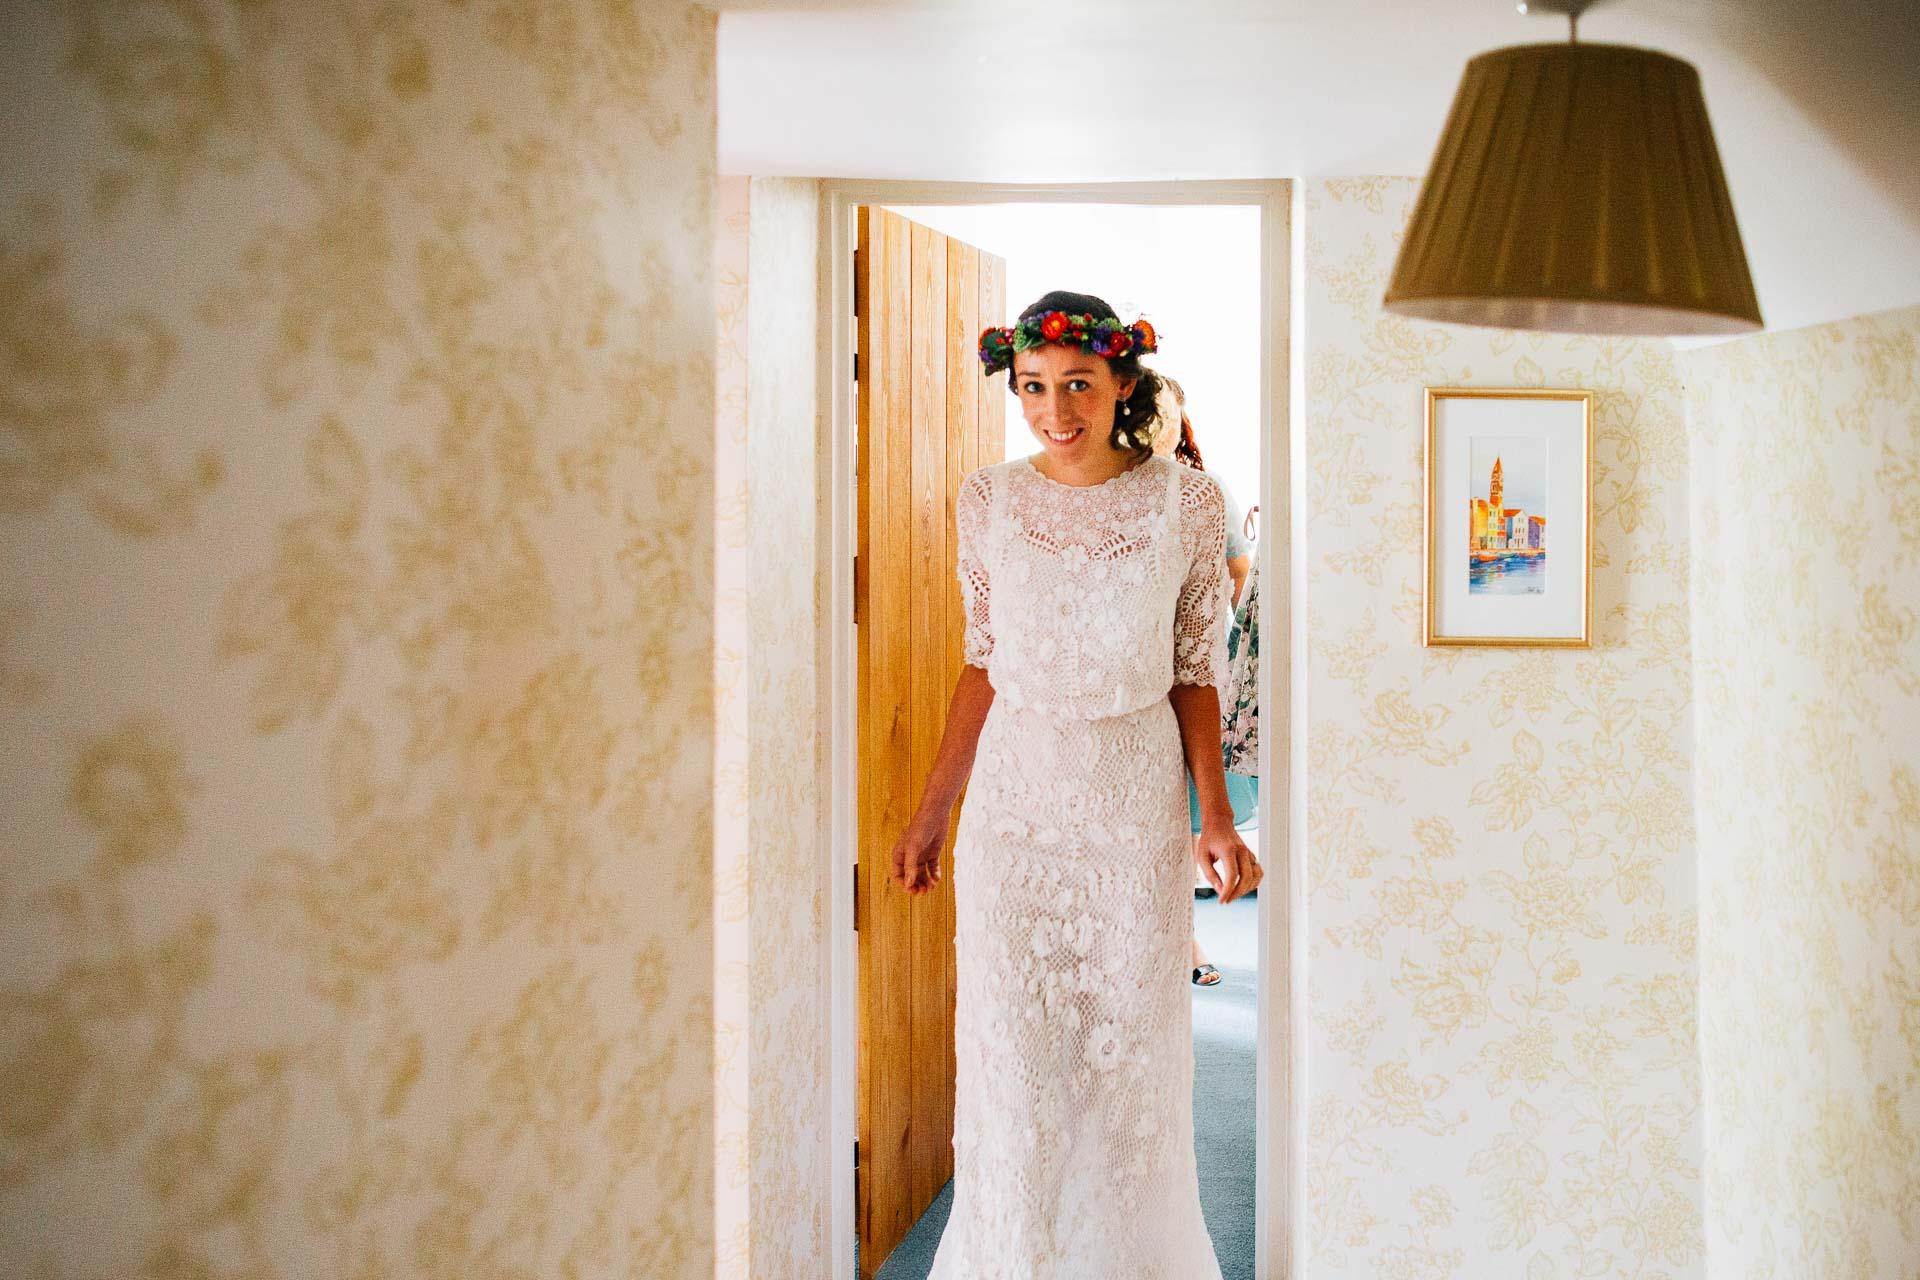 winterbourne-medieval-barn-wedding-photography-emma-andrew-47